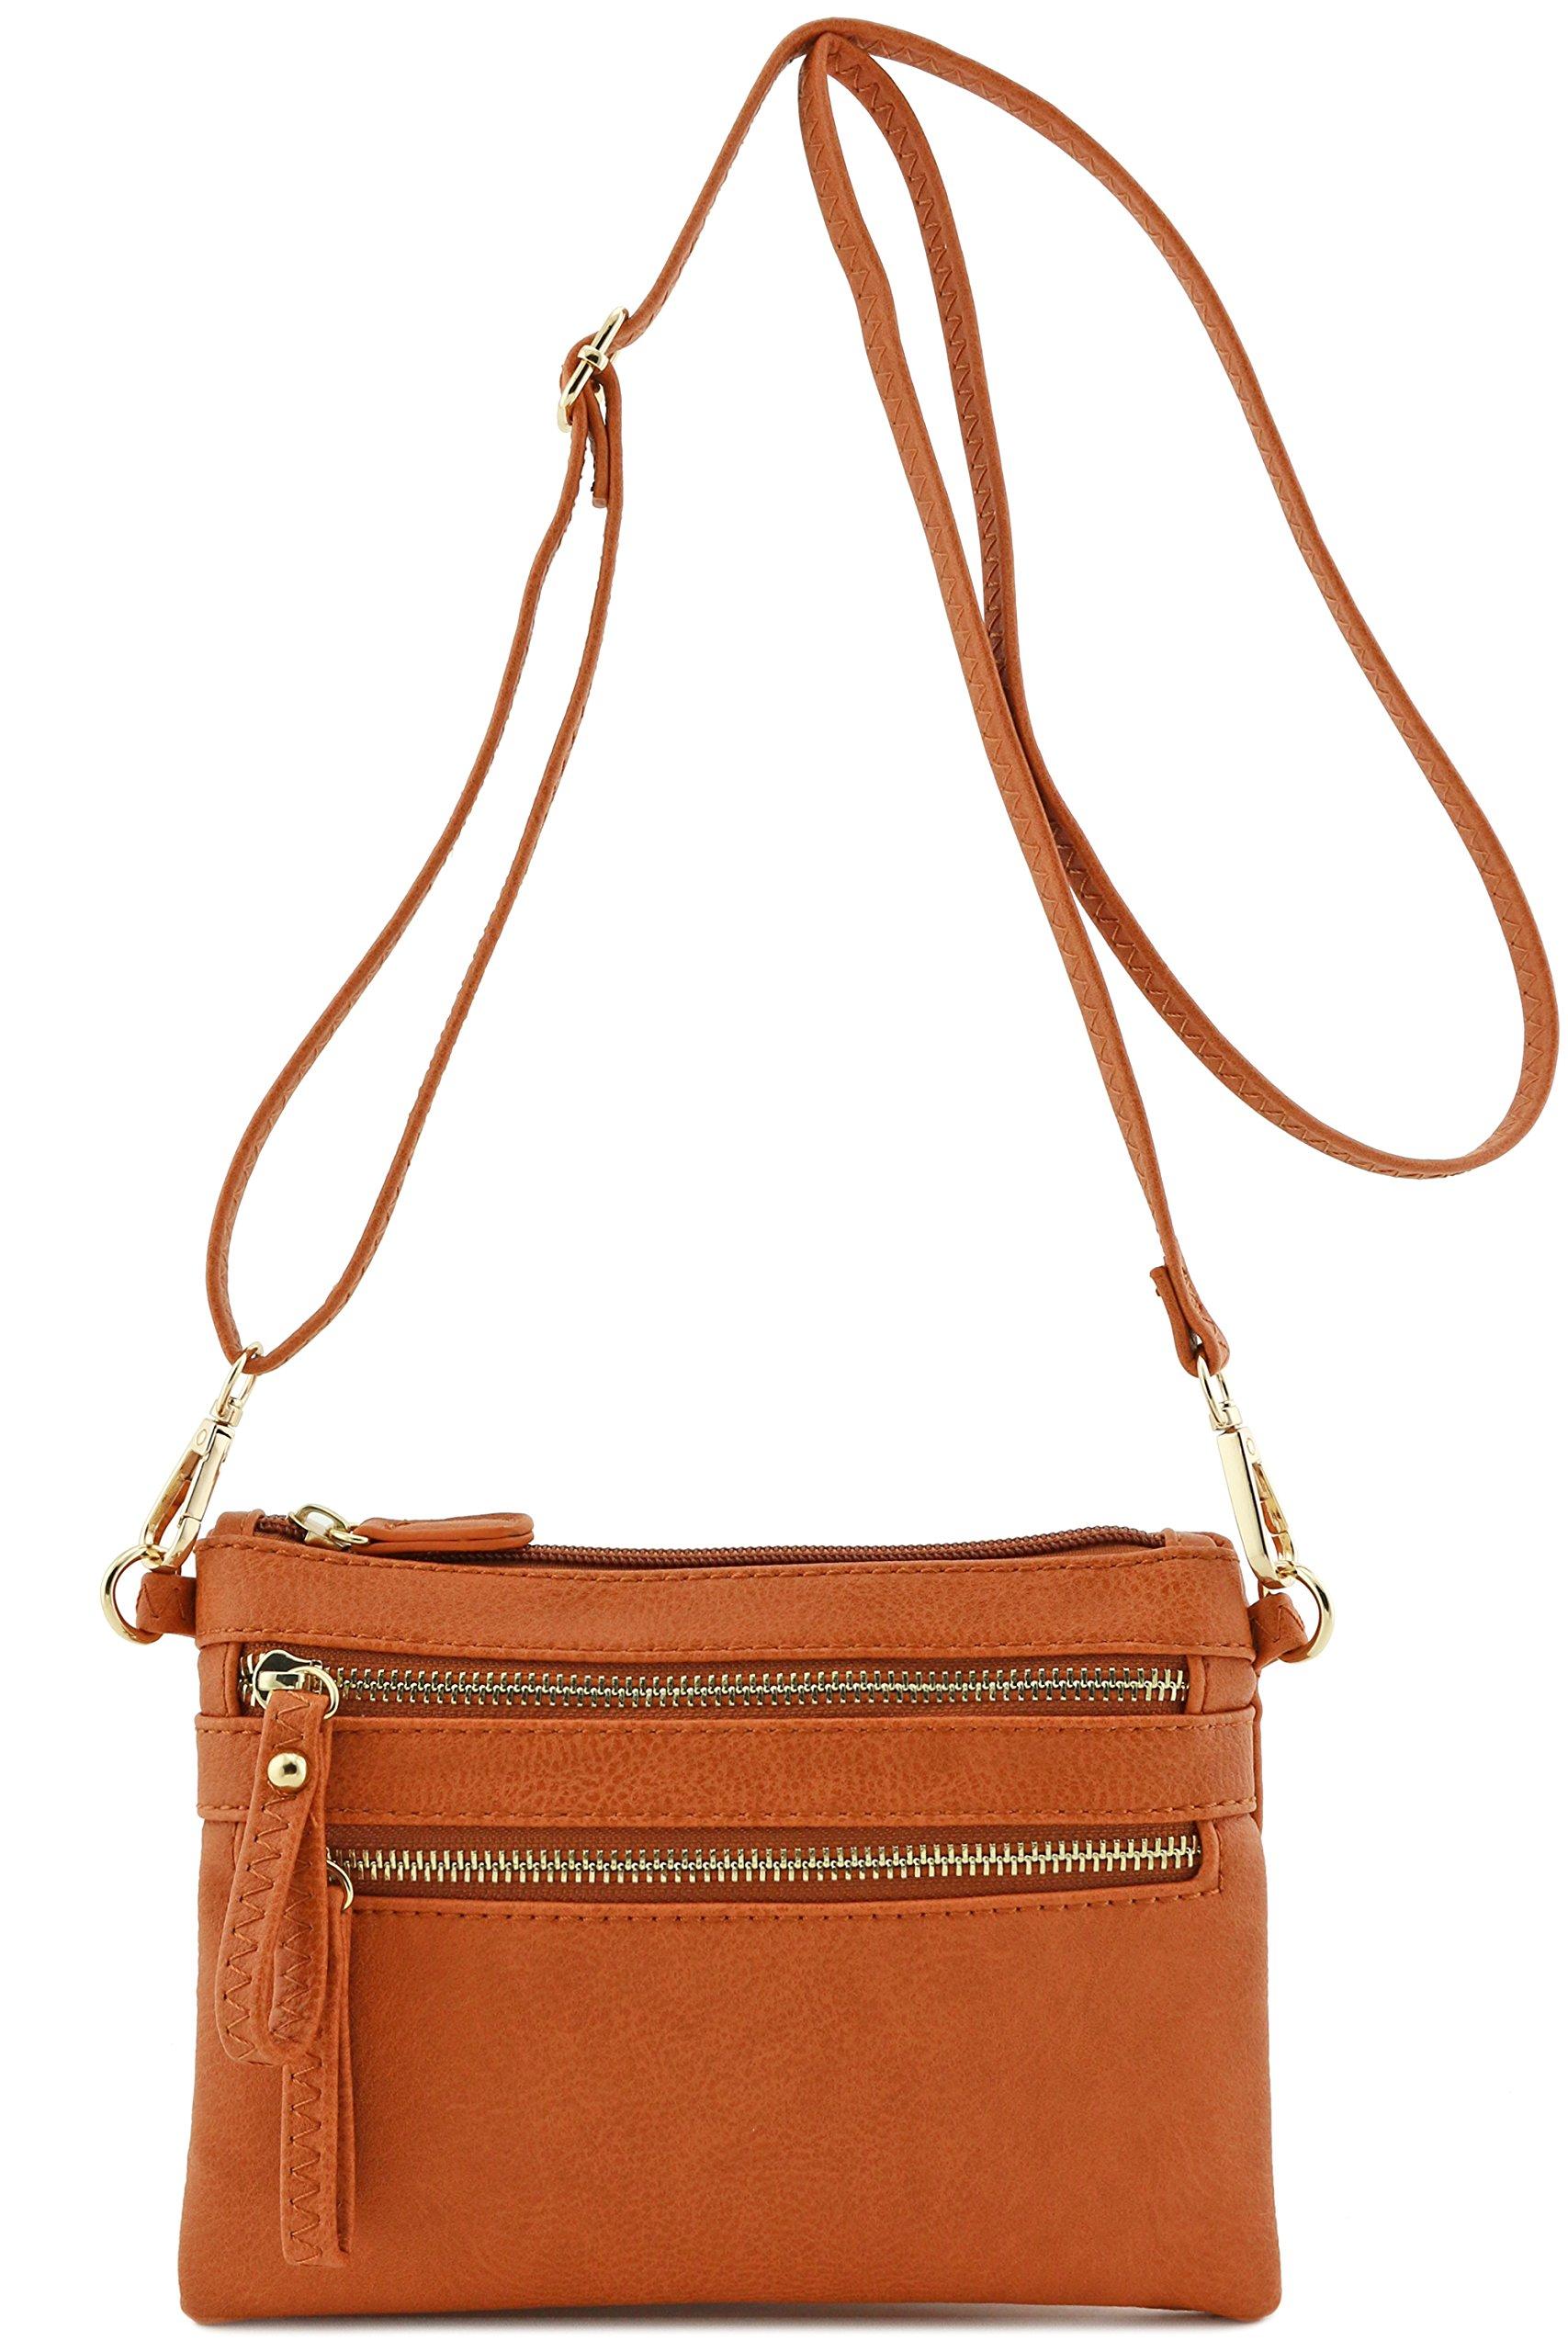 Multi Zipper Pocket Small Wristlet Crossbody Bag (Topaz)